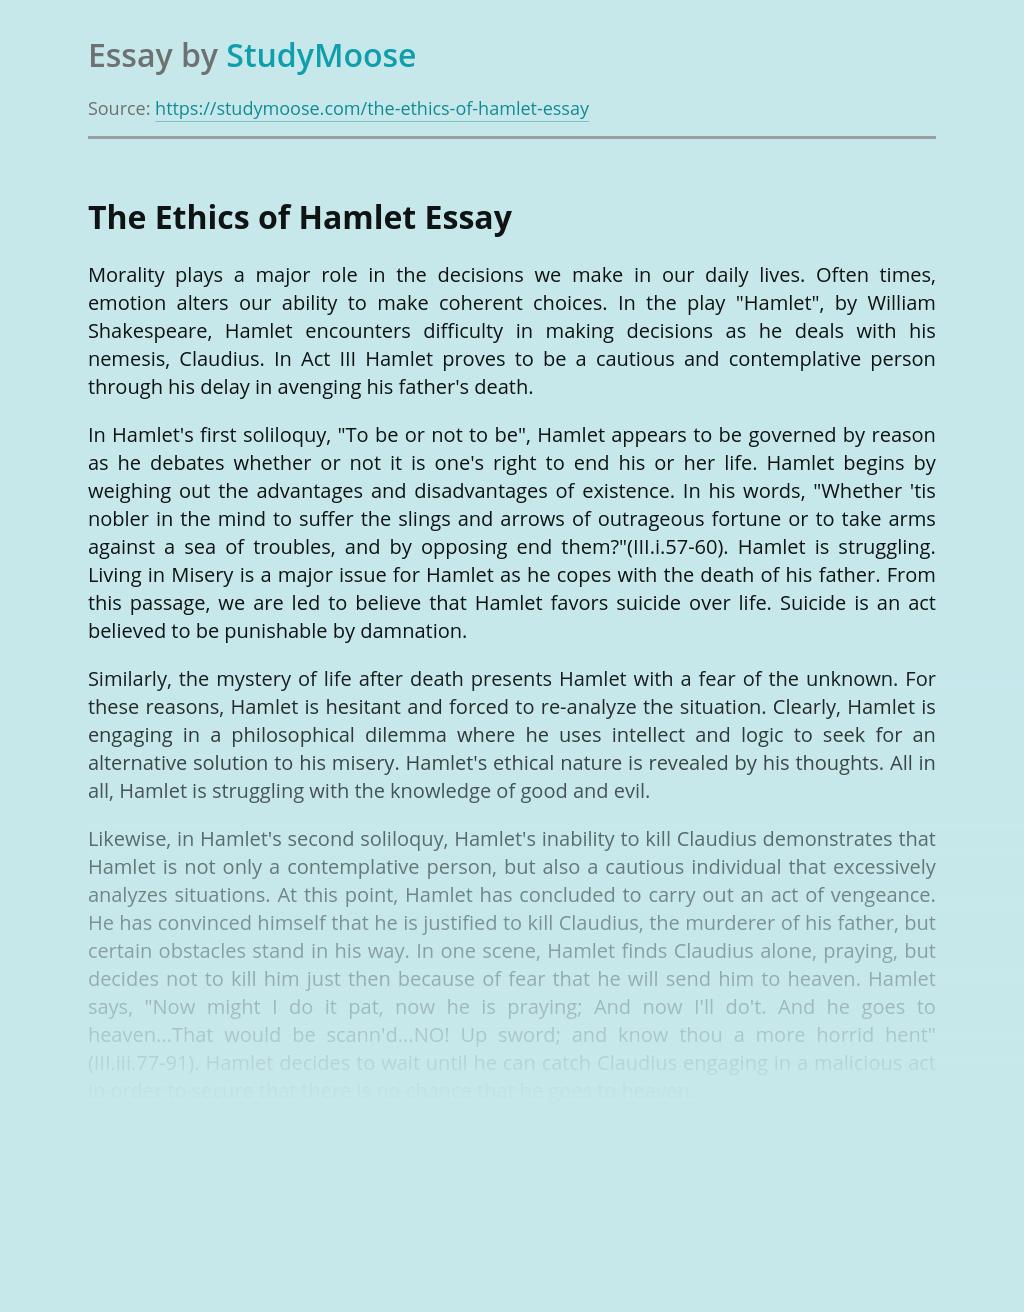 The Ethics of Hamlet